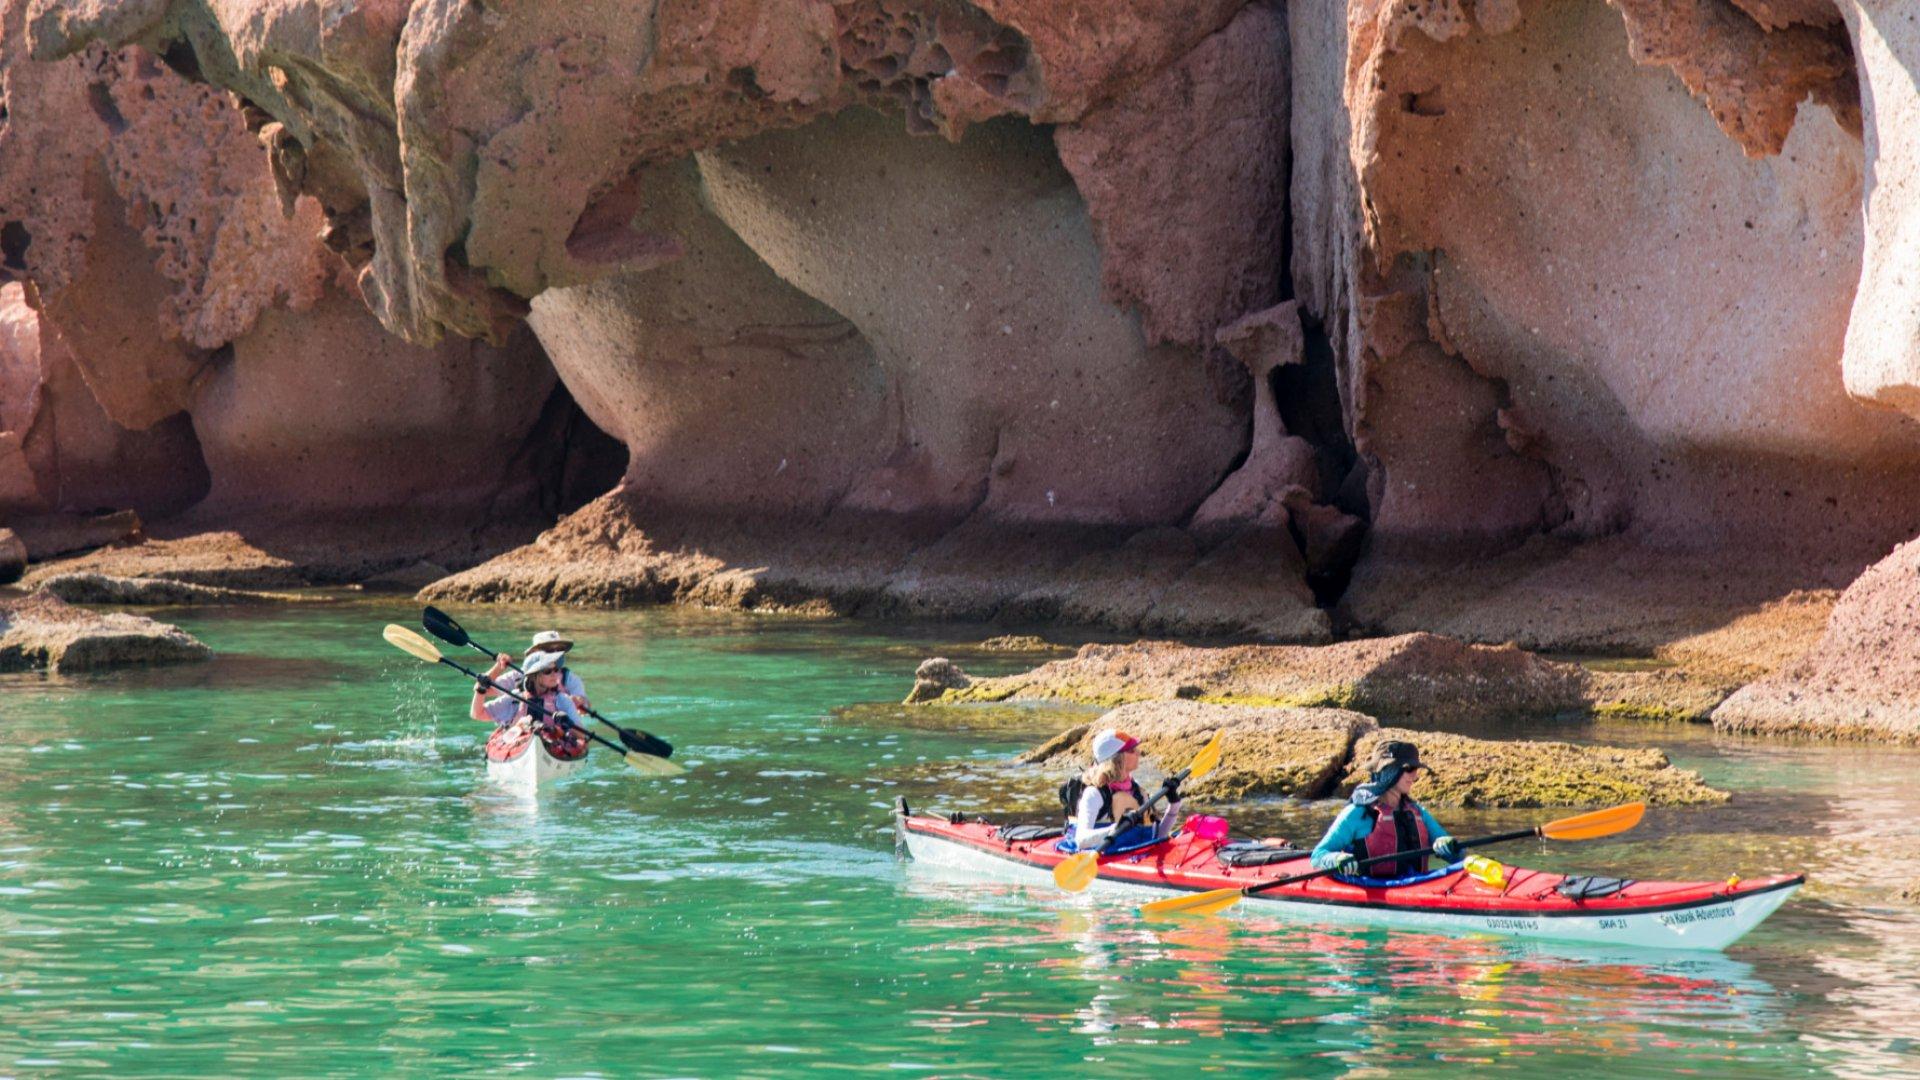 kayaks in front of rock formations along espiritu santo